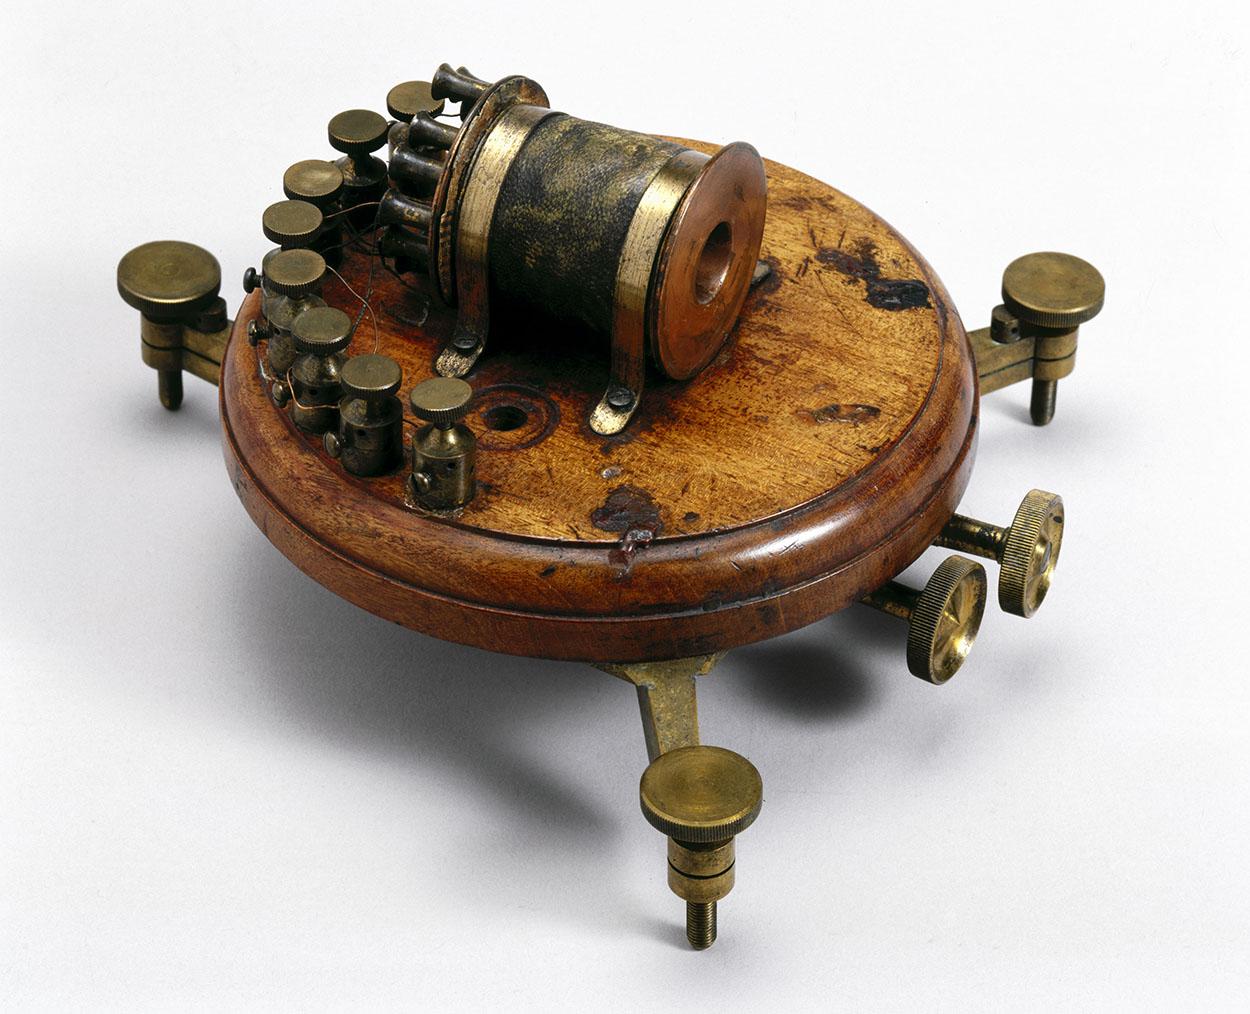 Fil Thomsons Mirror Galvanometer 1858 9663806048 Jpg Wikipedia